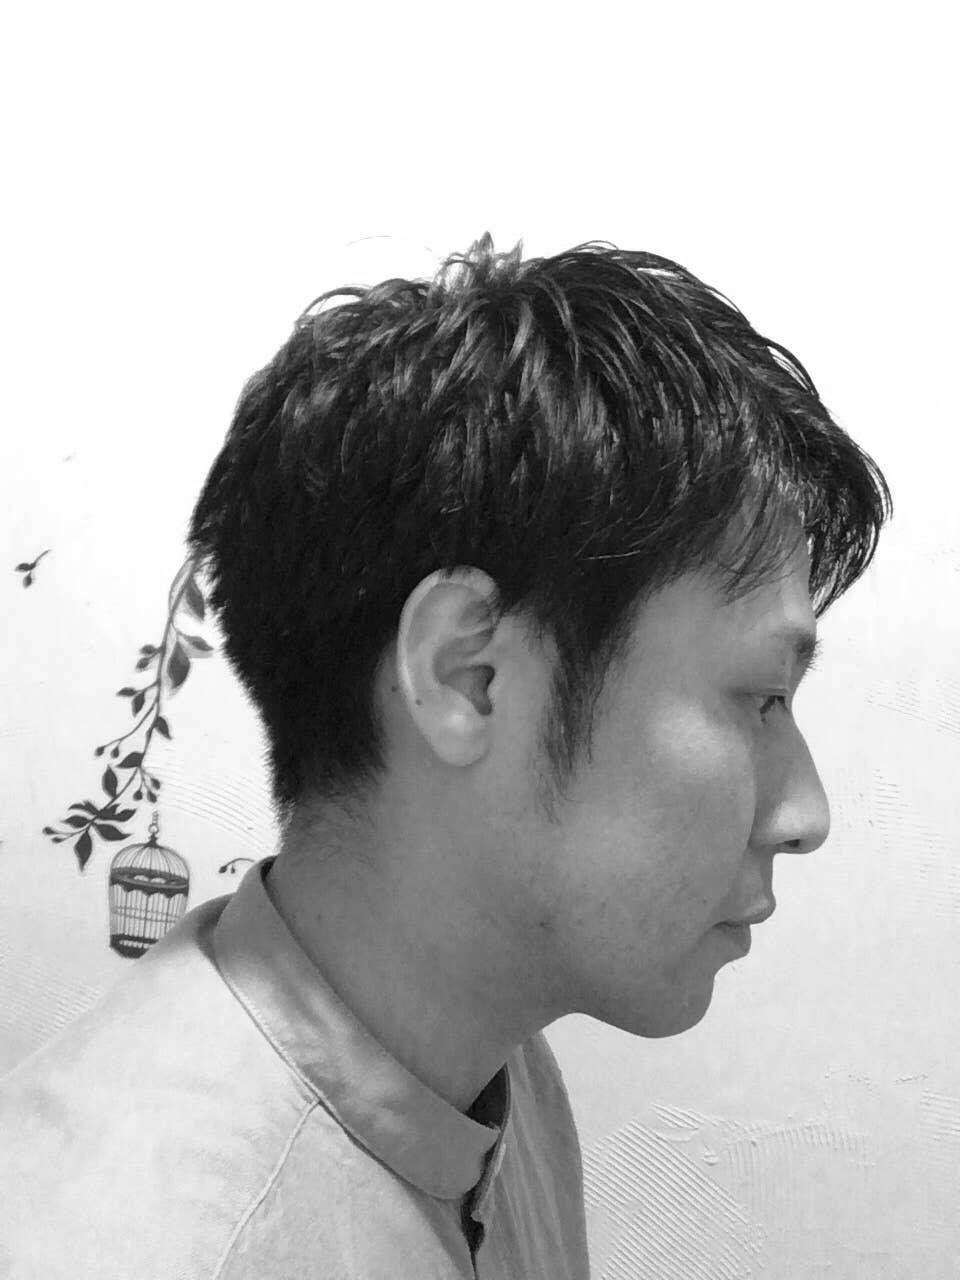 M.Kawamoto